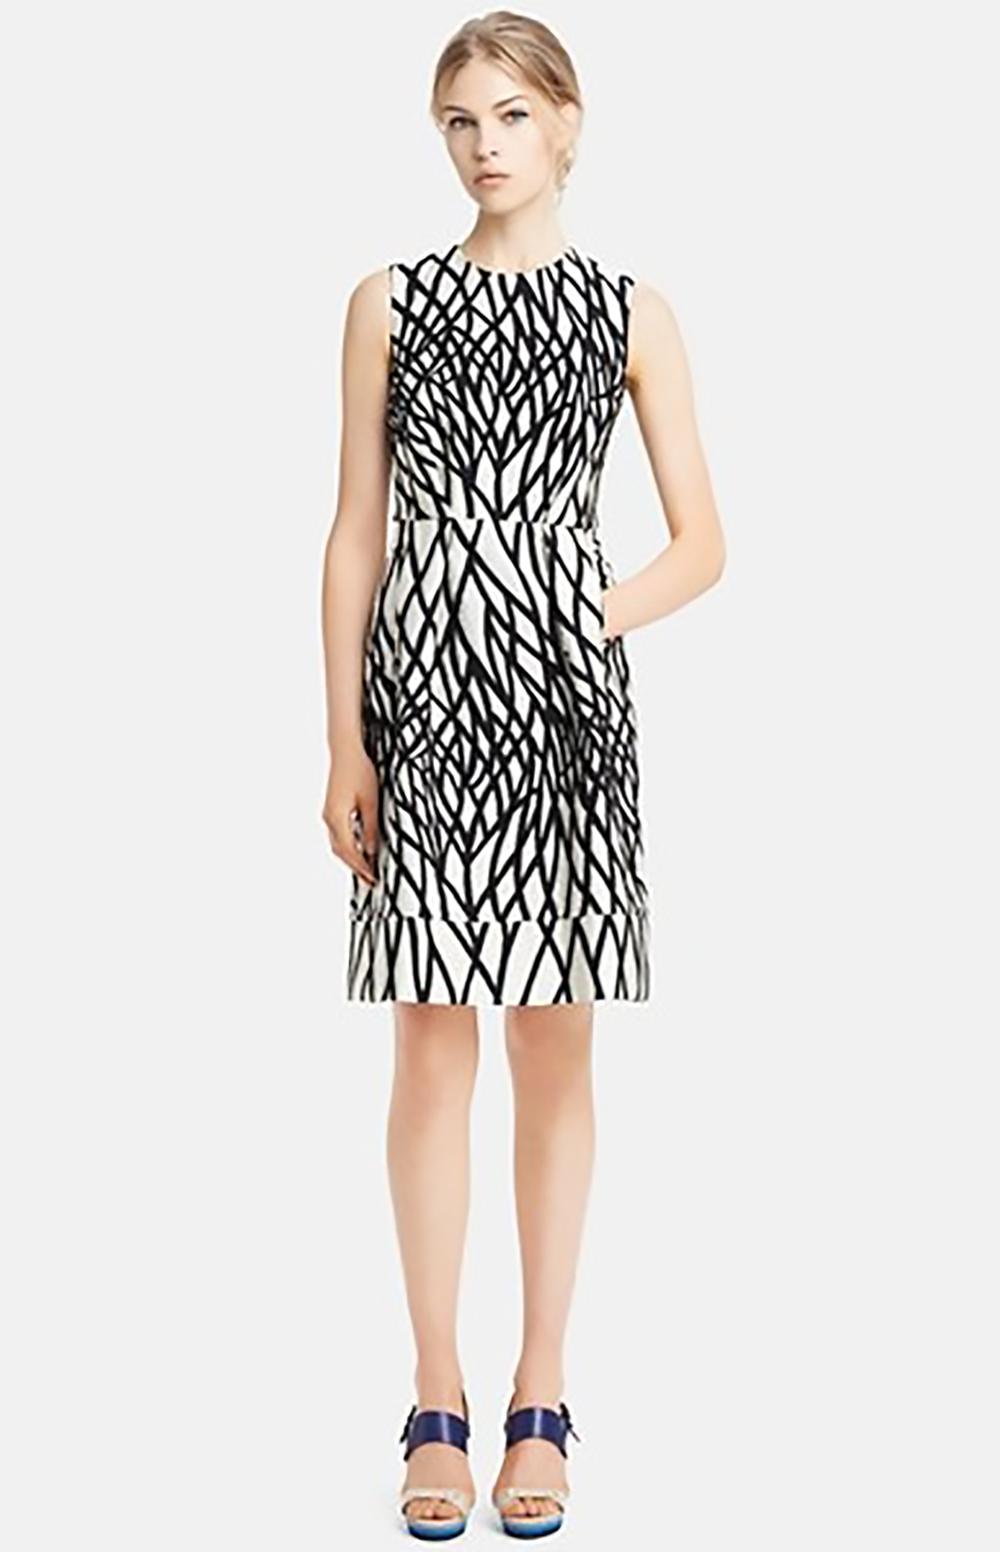 nordstrom marni jacquard cotton blend dress sheath dress 1500.jpg